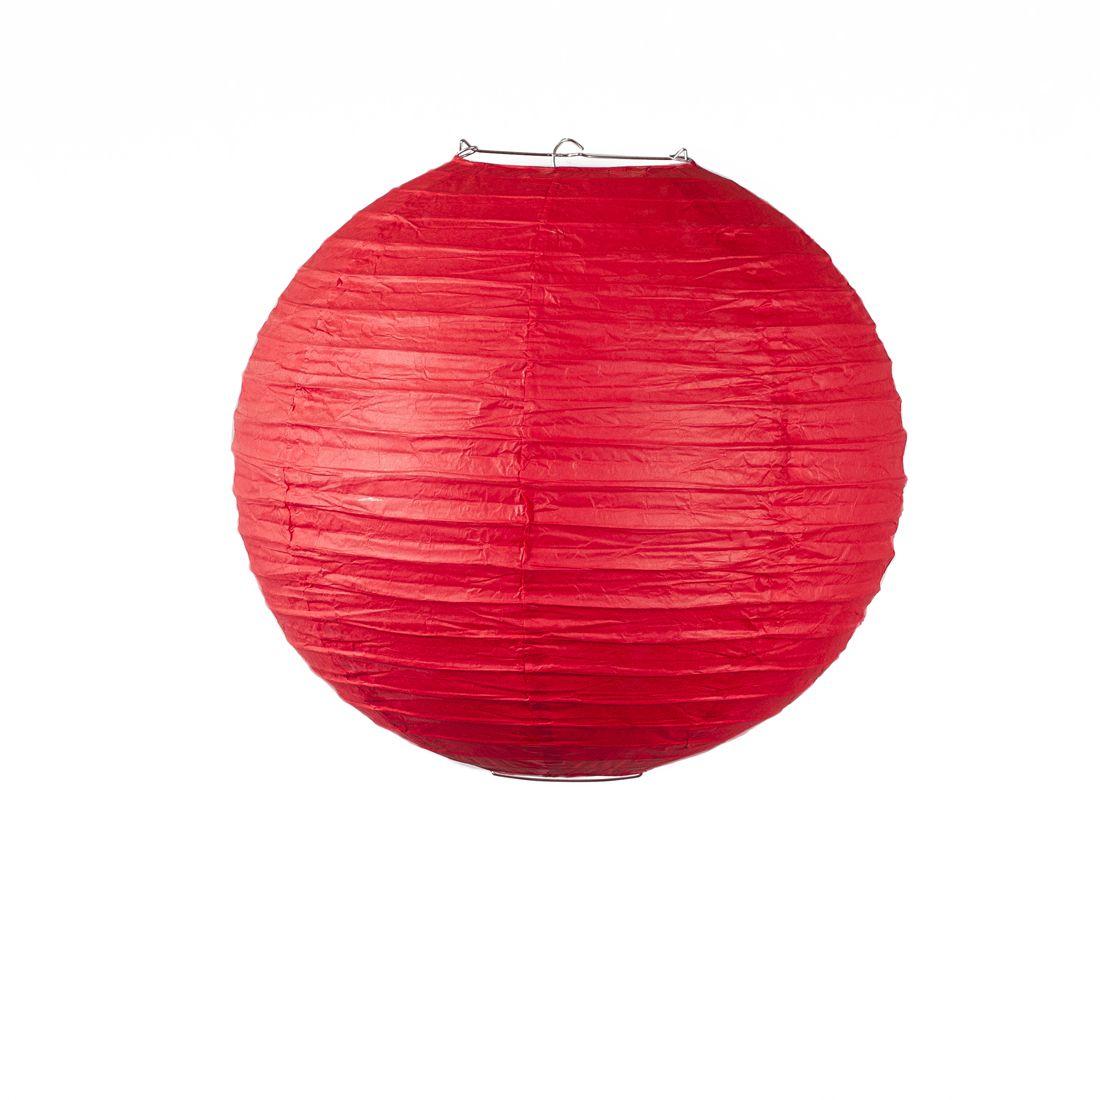 16 In Red Paper Lantern Red Paper Paper Lanterns Lanterns